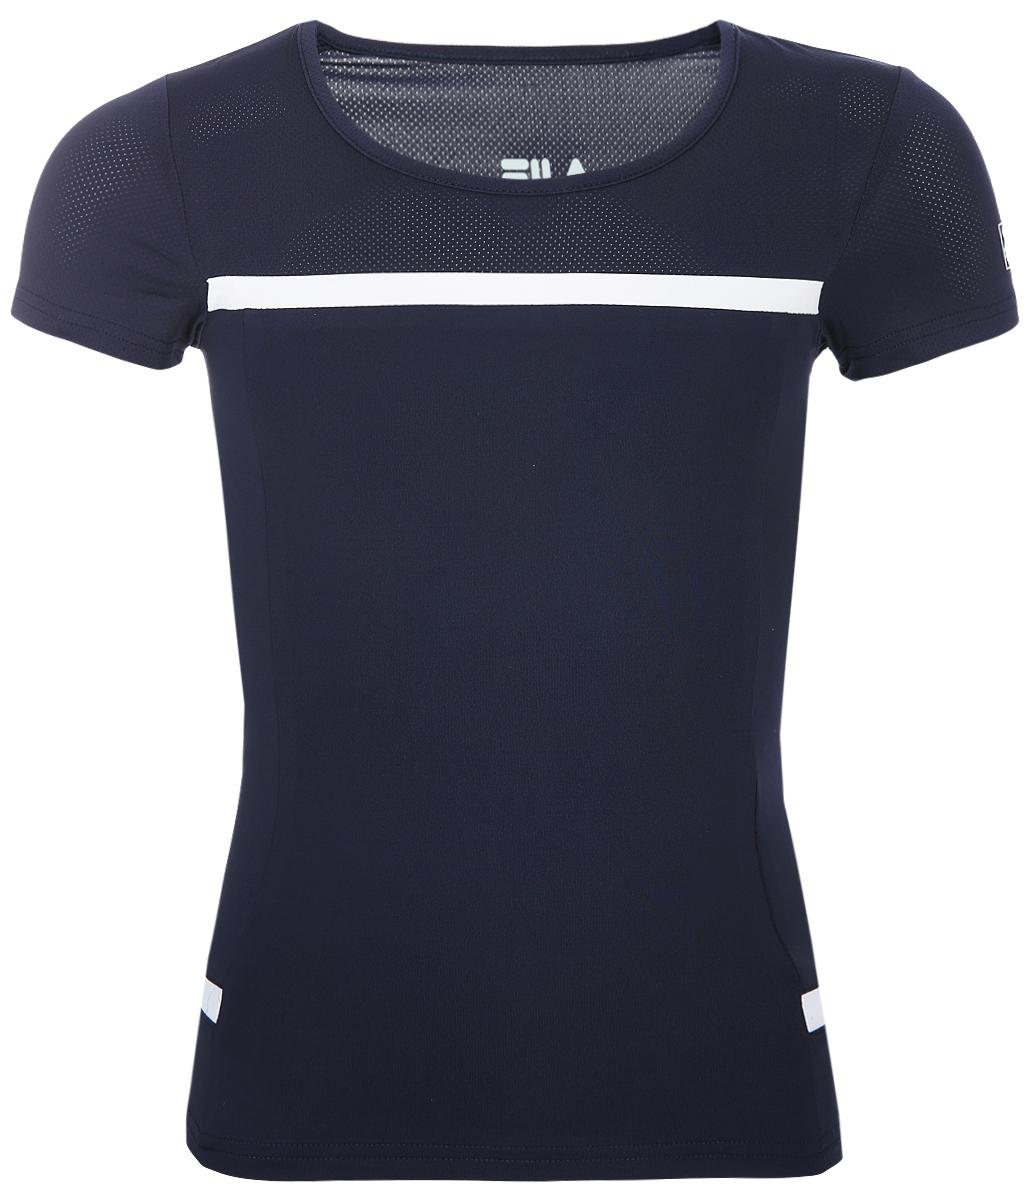 Футболка Fila Girl's tennis T-shirt velante 502 711 01